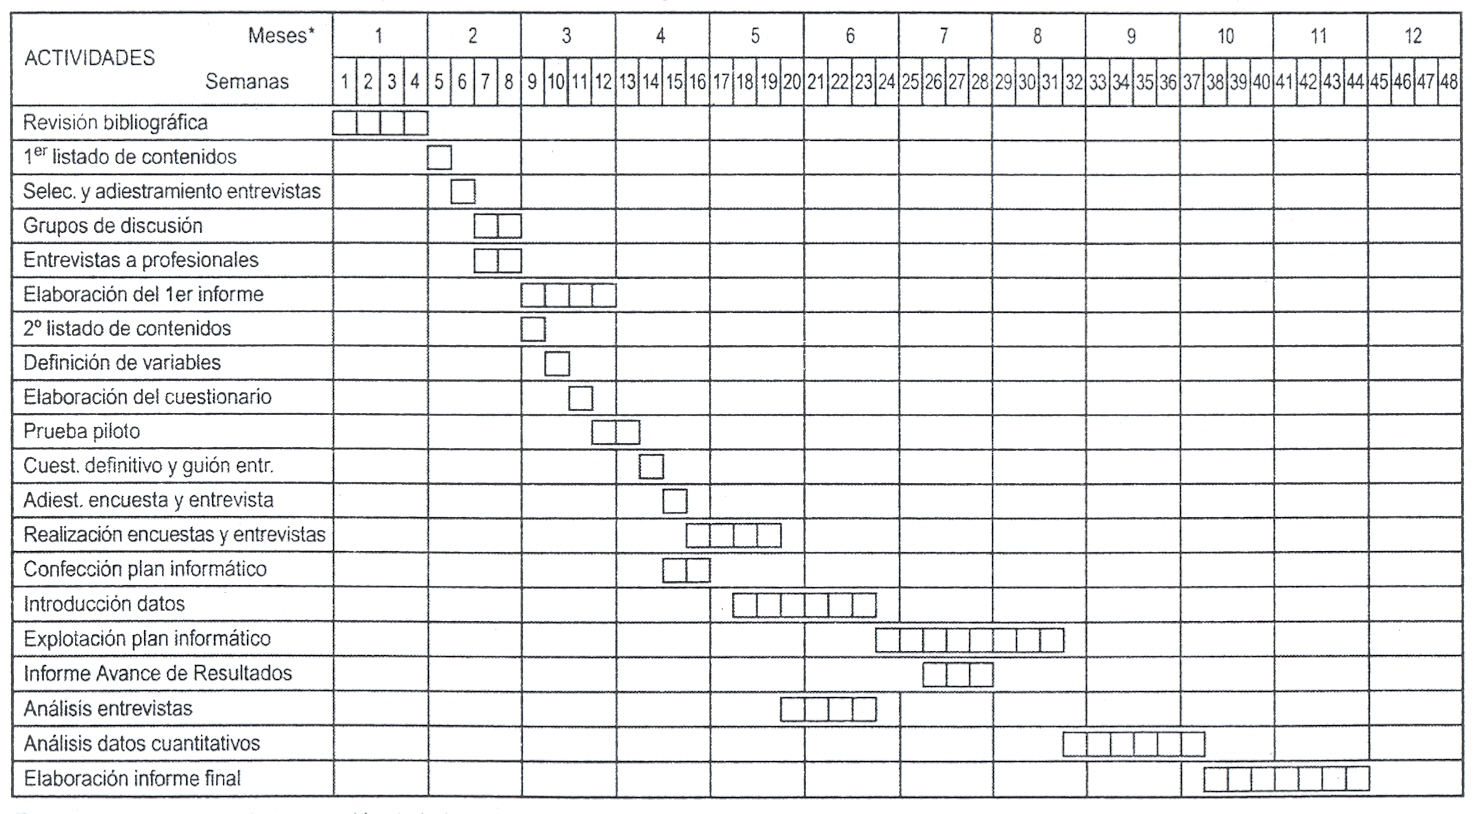 El portal de la tesis diagrama de gantt ccuart Image collections